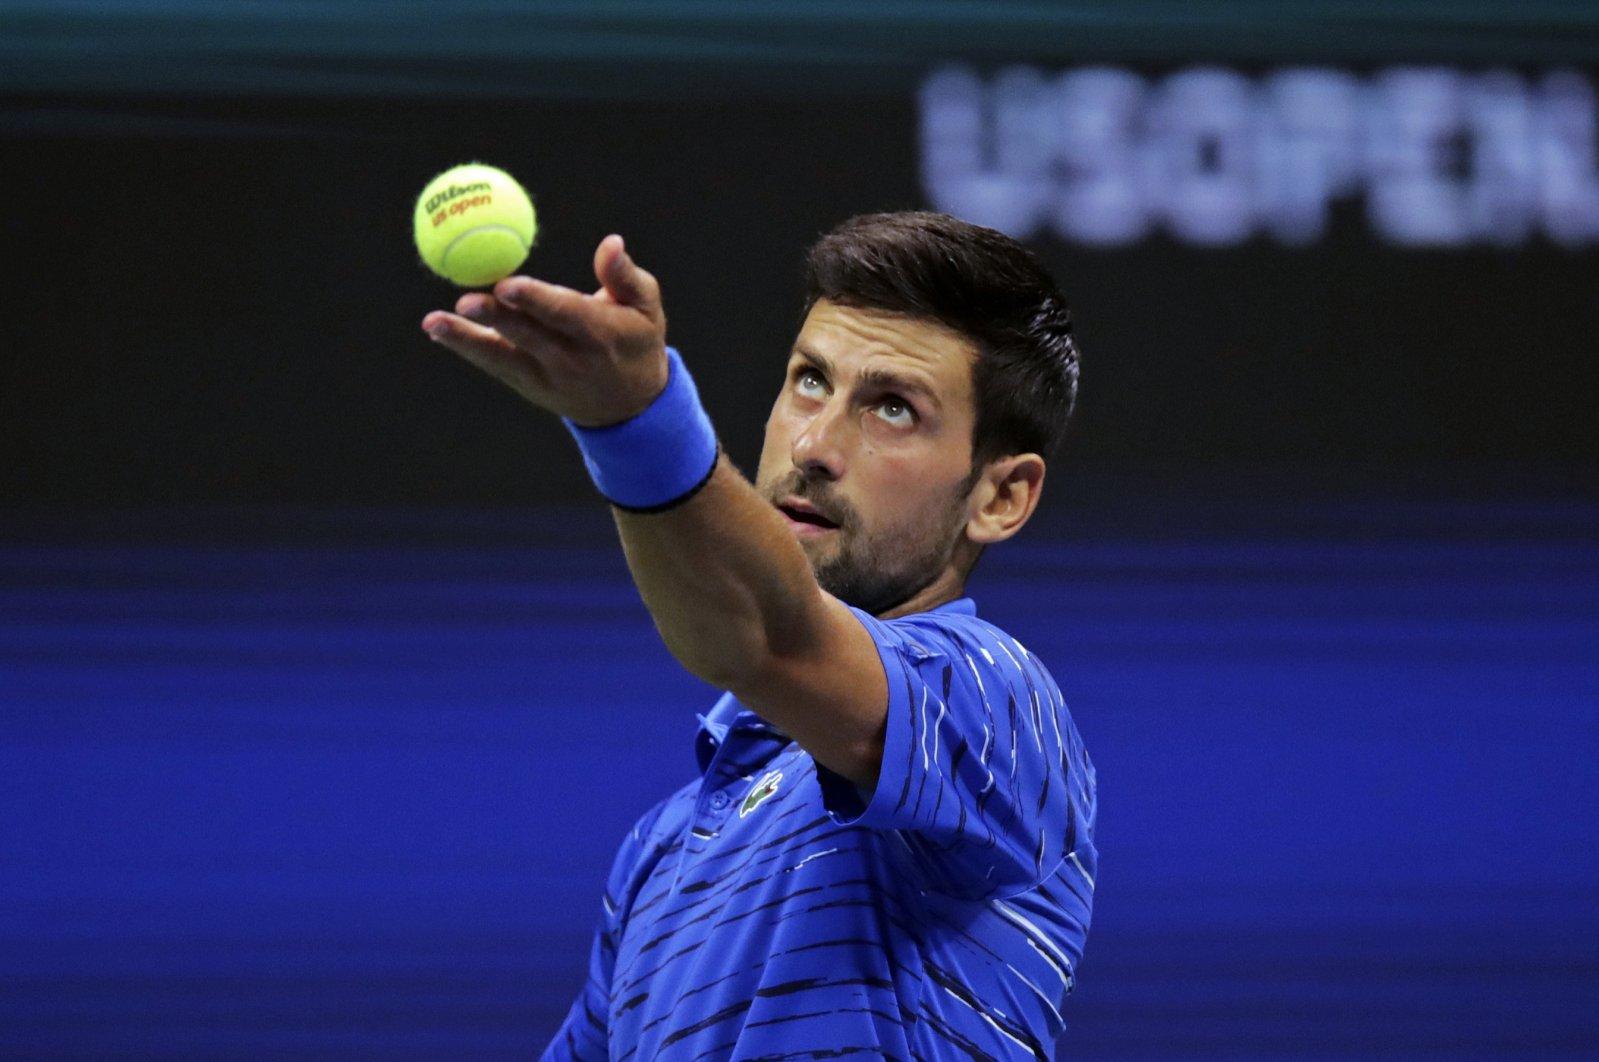 Novak Djokovic serves Denis Kudla during the U.S. Open tennis tournament, New York, U.S., Aug. 30, 2019. (AP Photo)